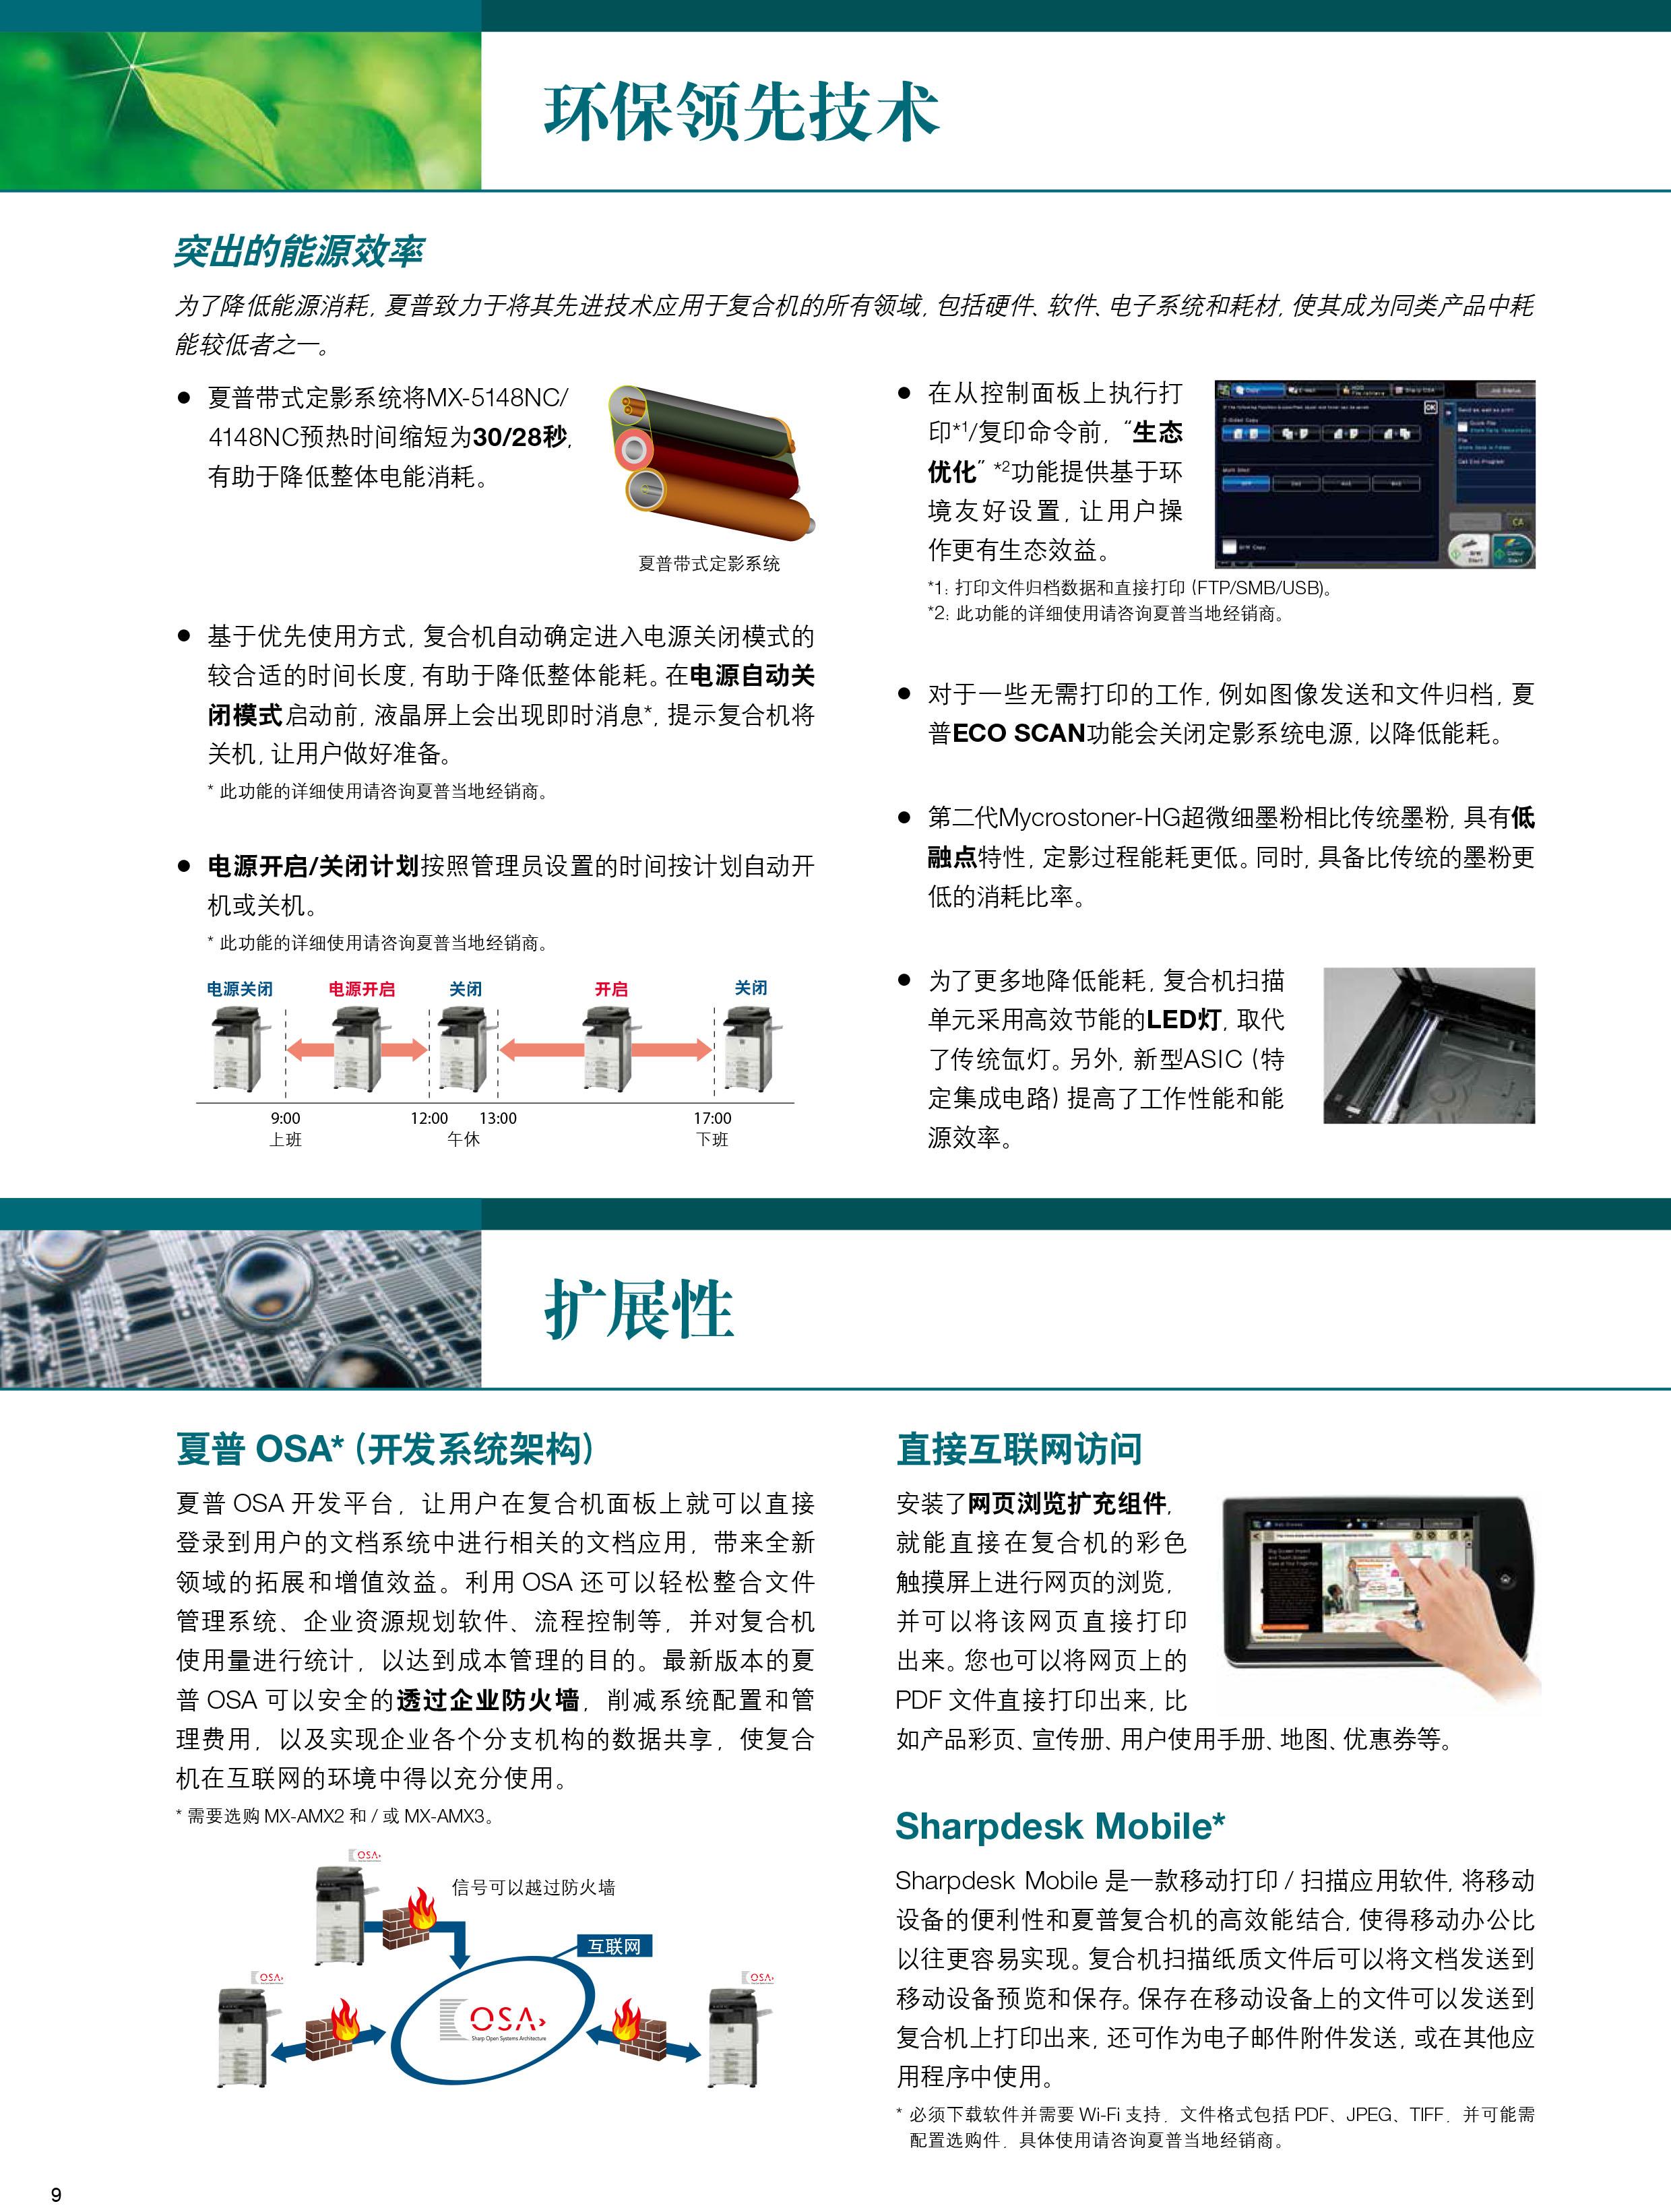 MX-5148NC_4148NC彩頁-10.jpg